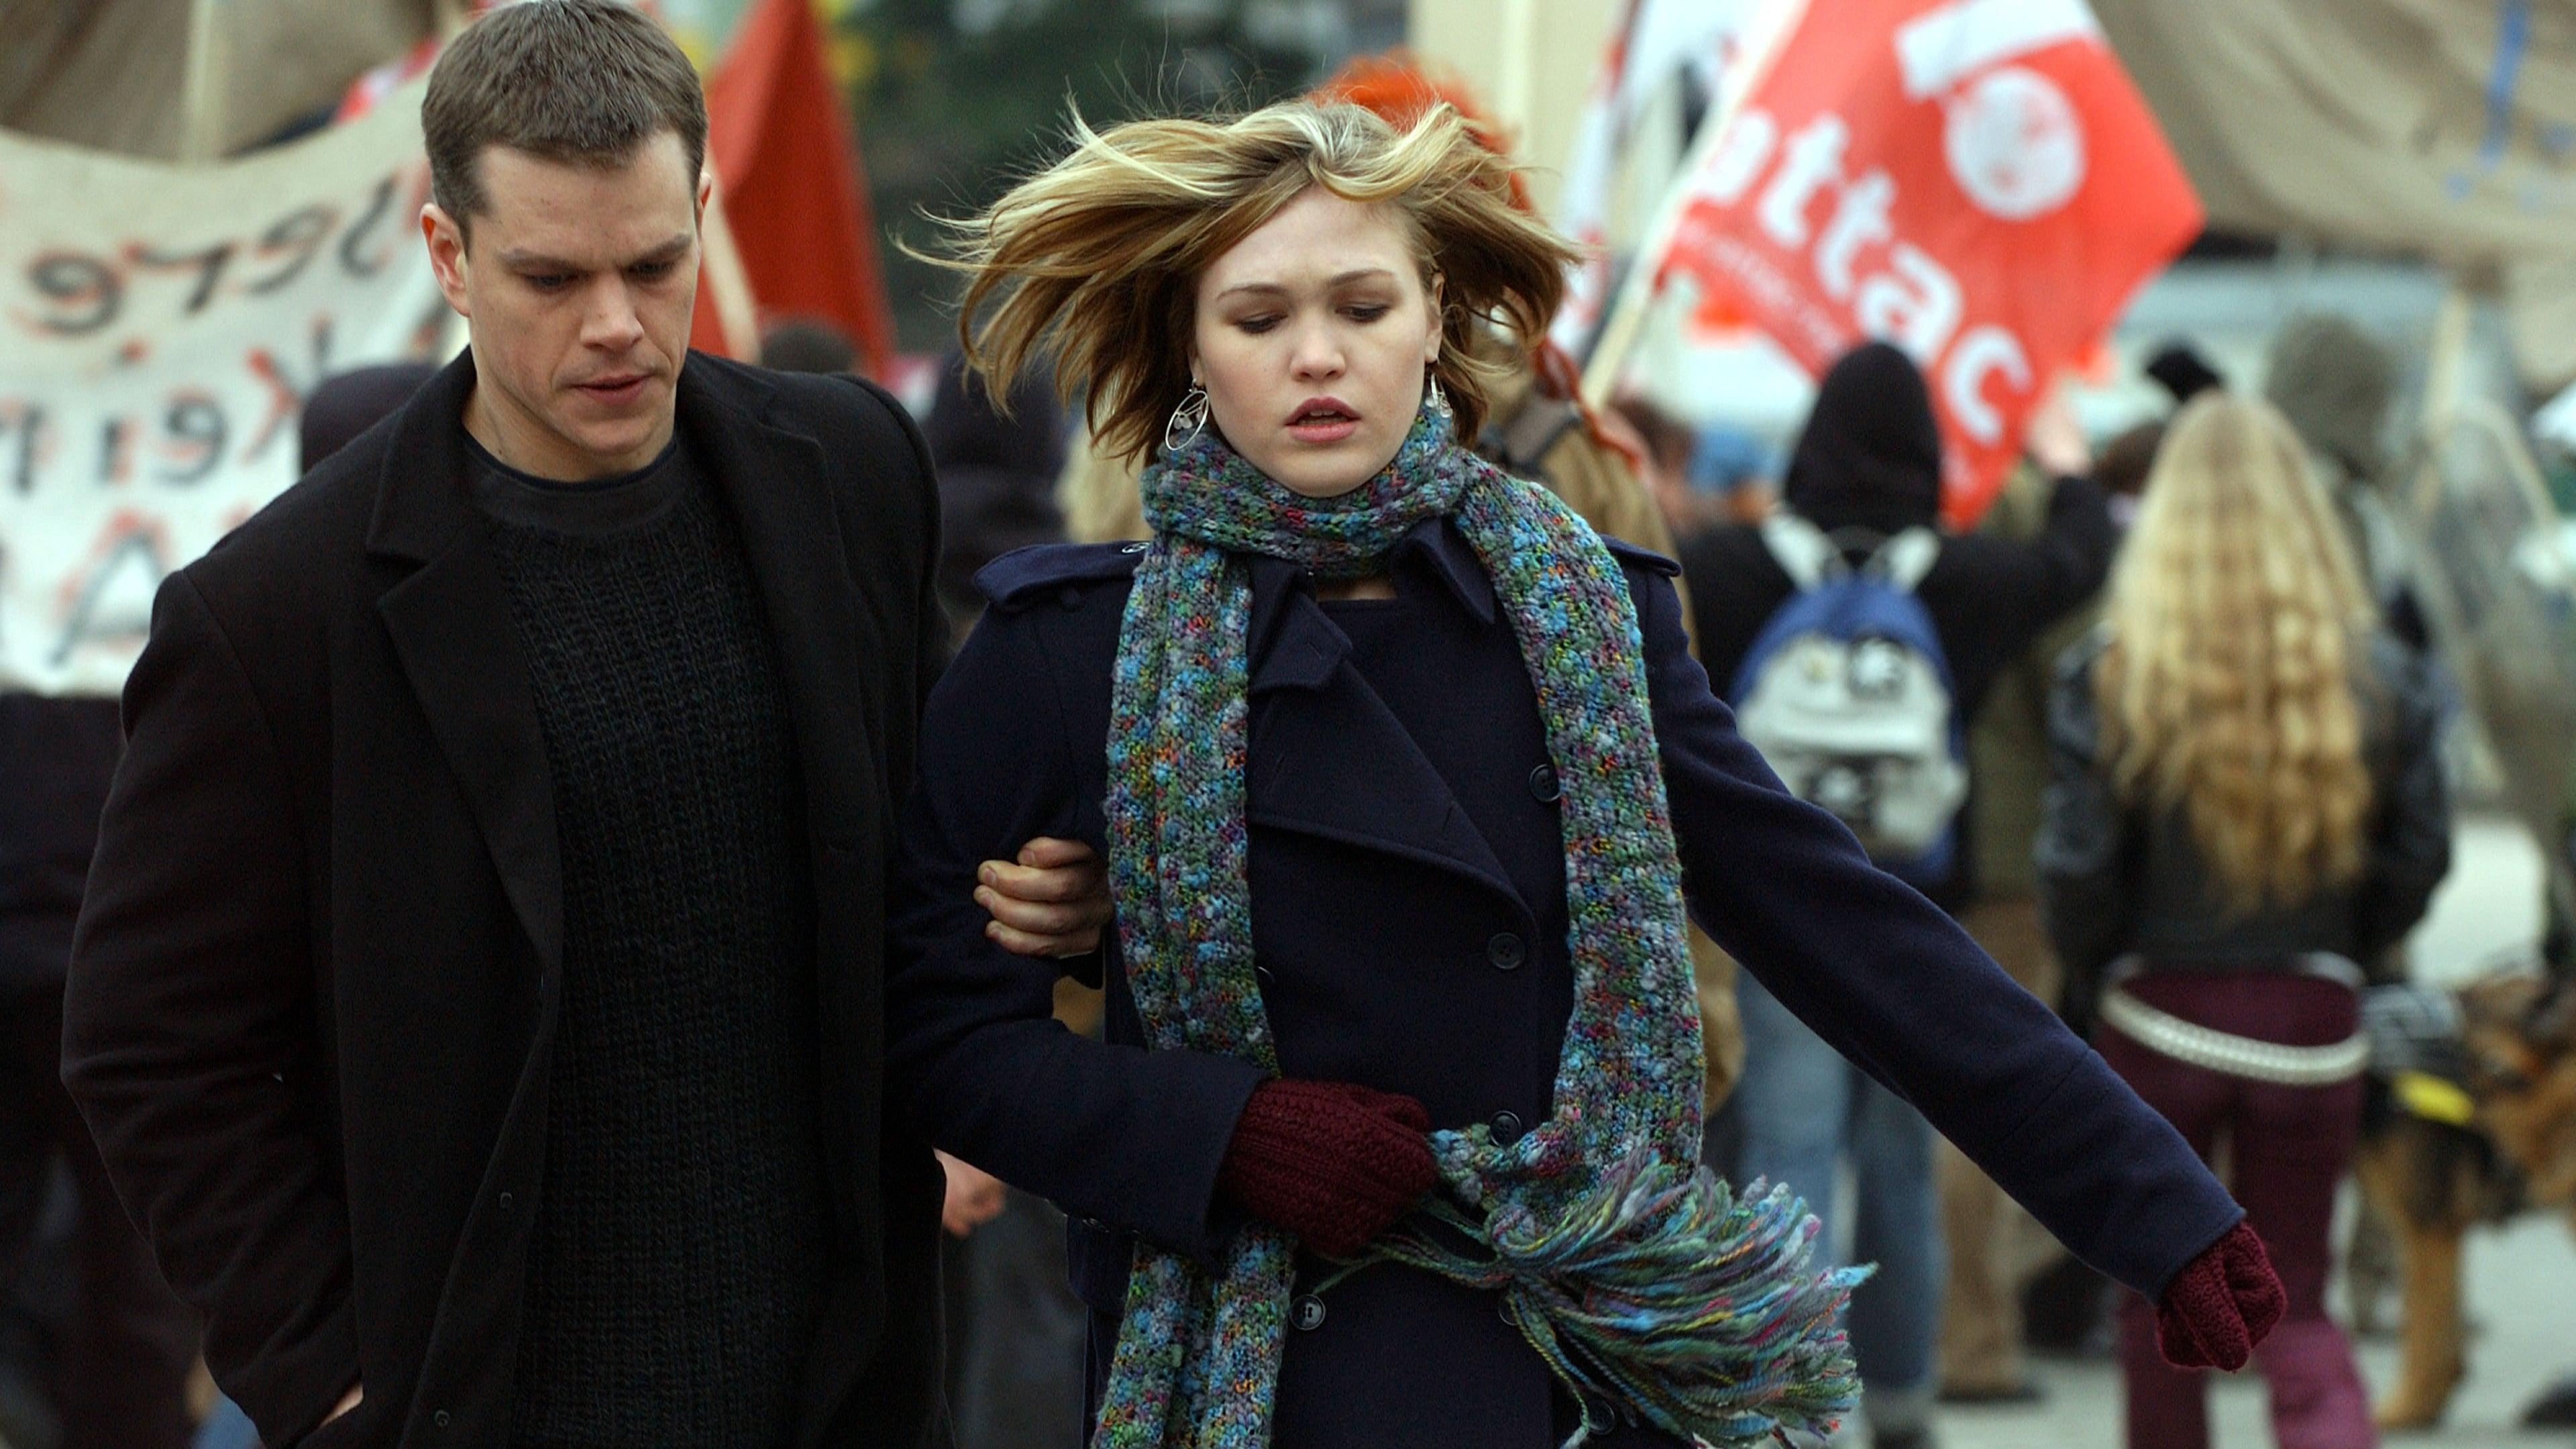 Watch The Bourne Supremacy 2004 Movie